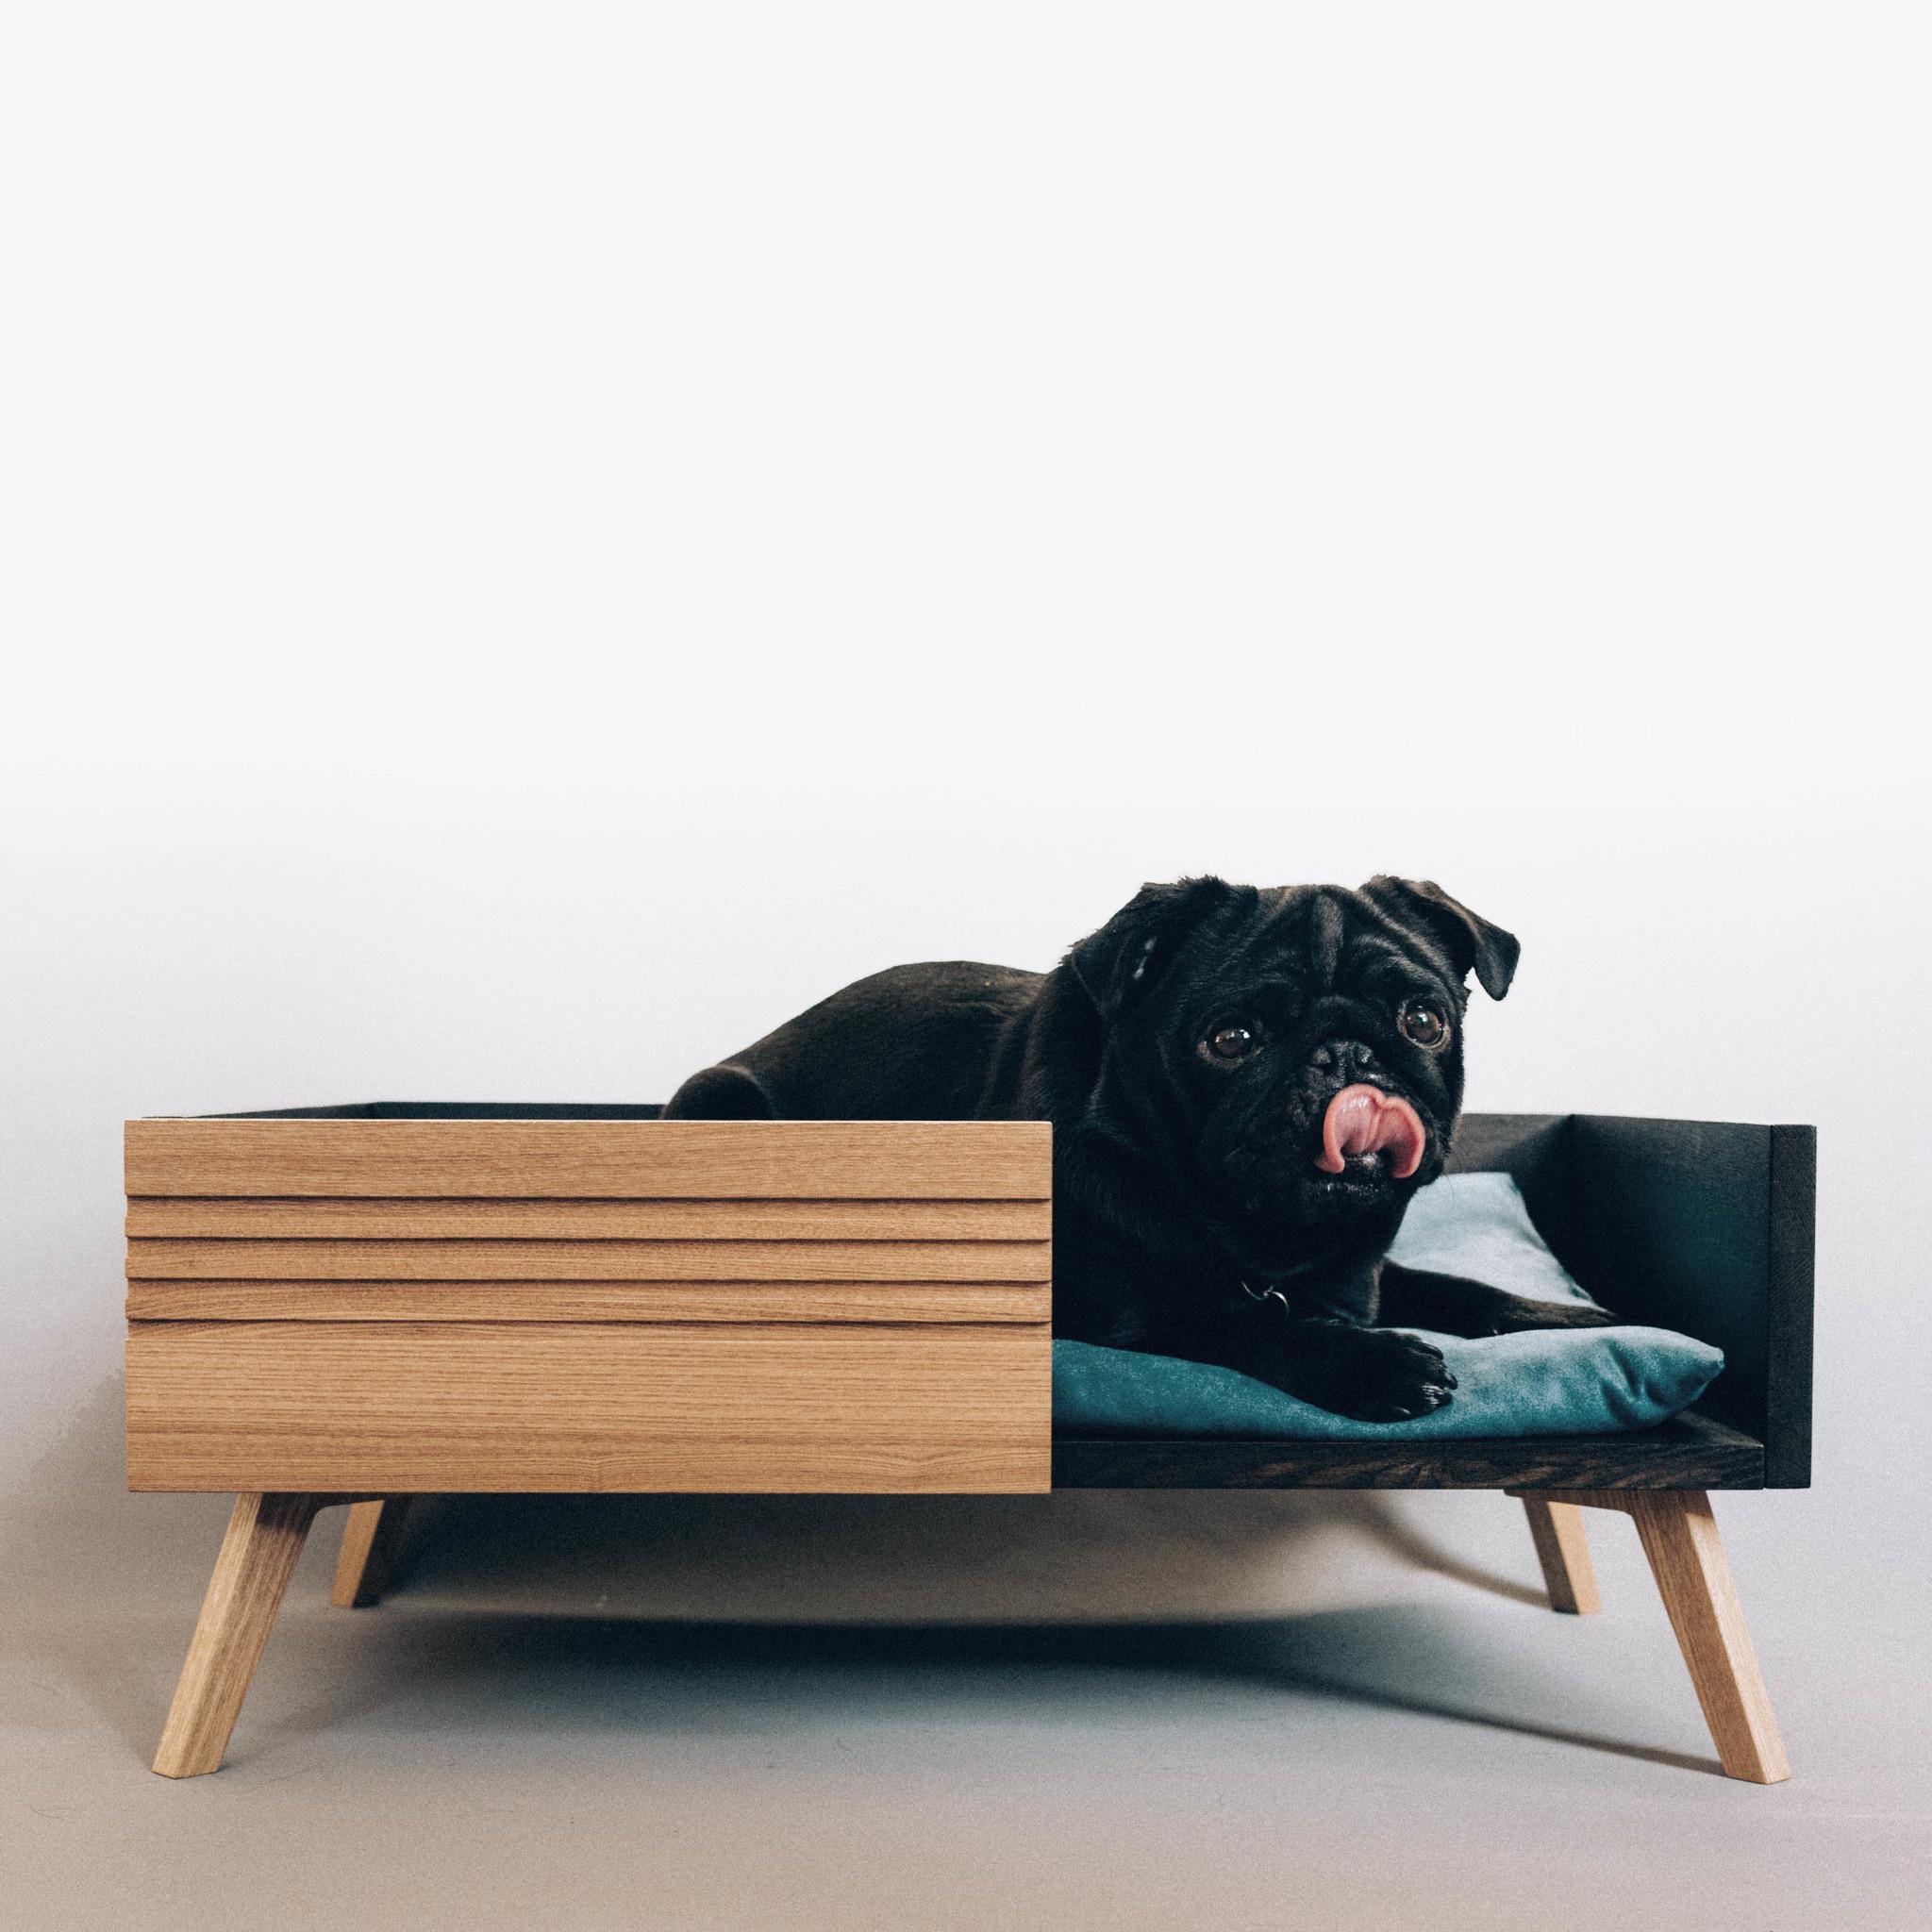 Лежанка для собаки в стиле модерн